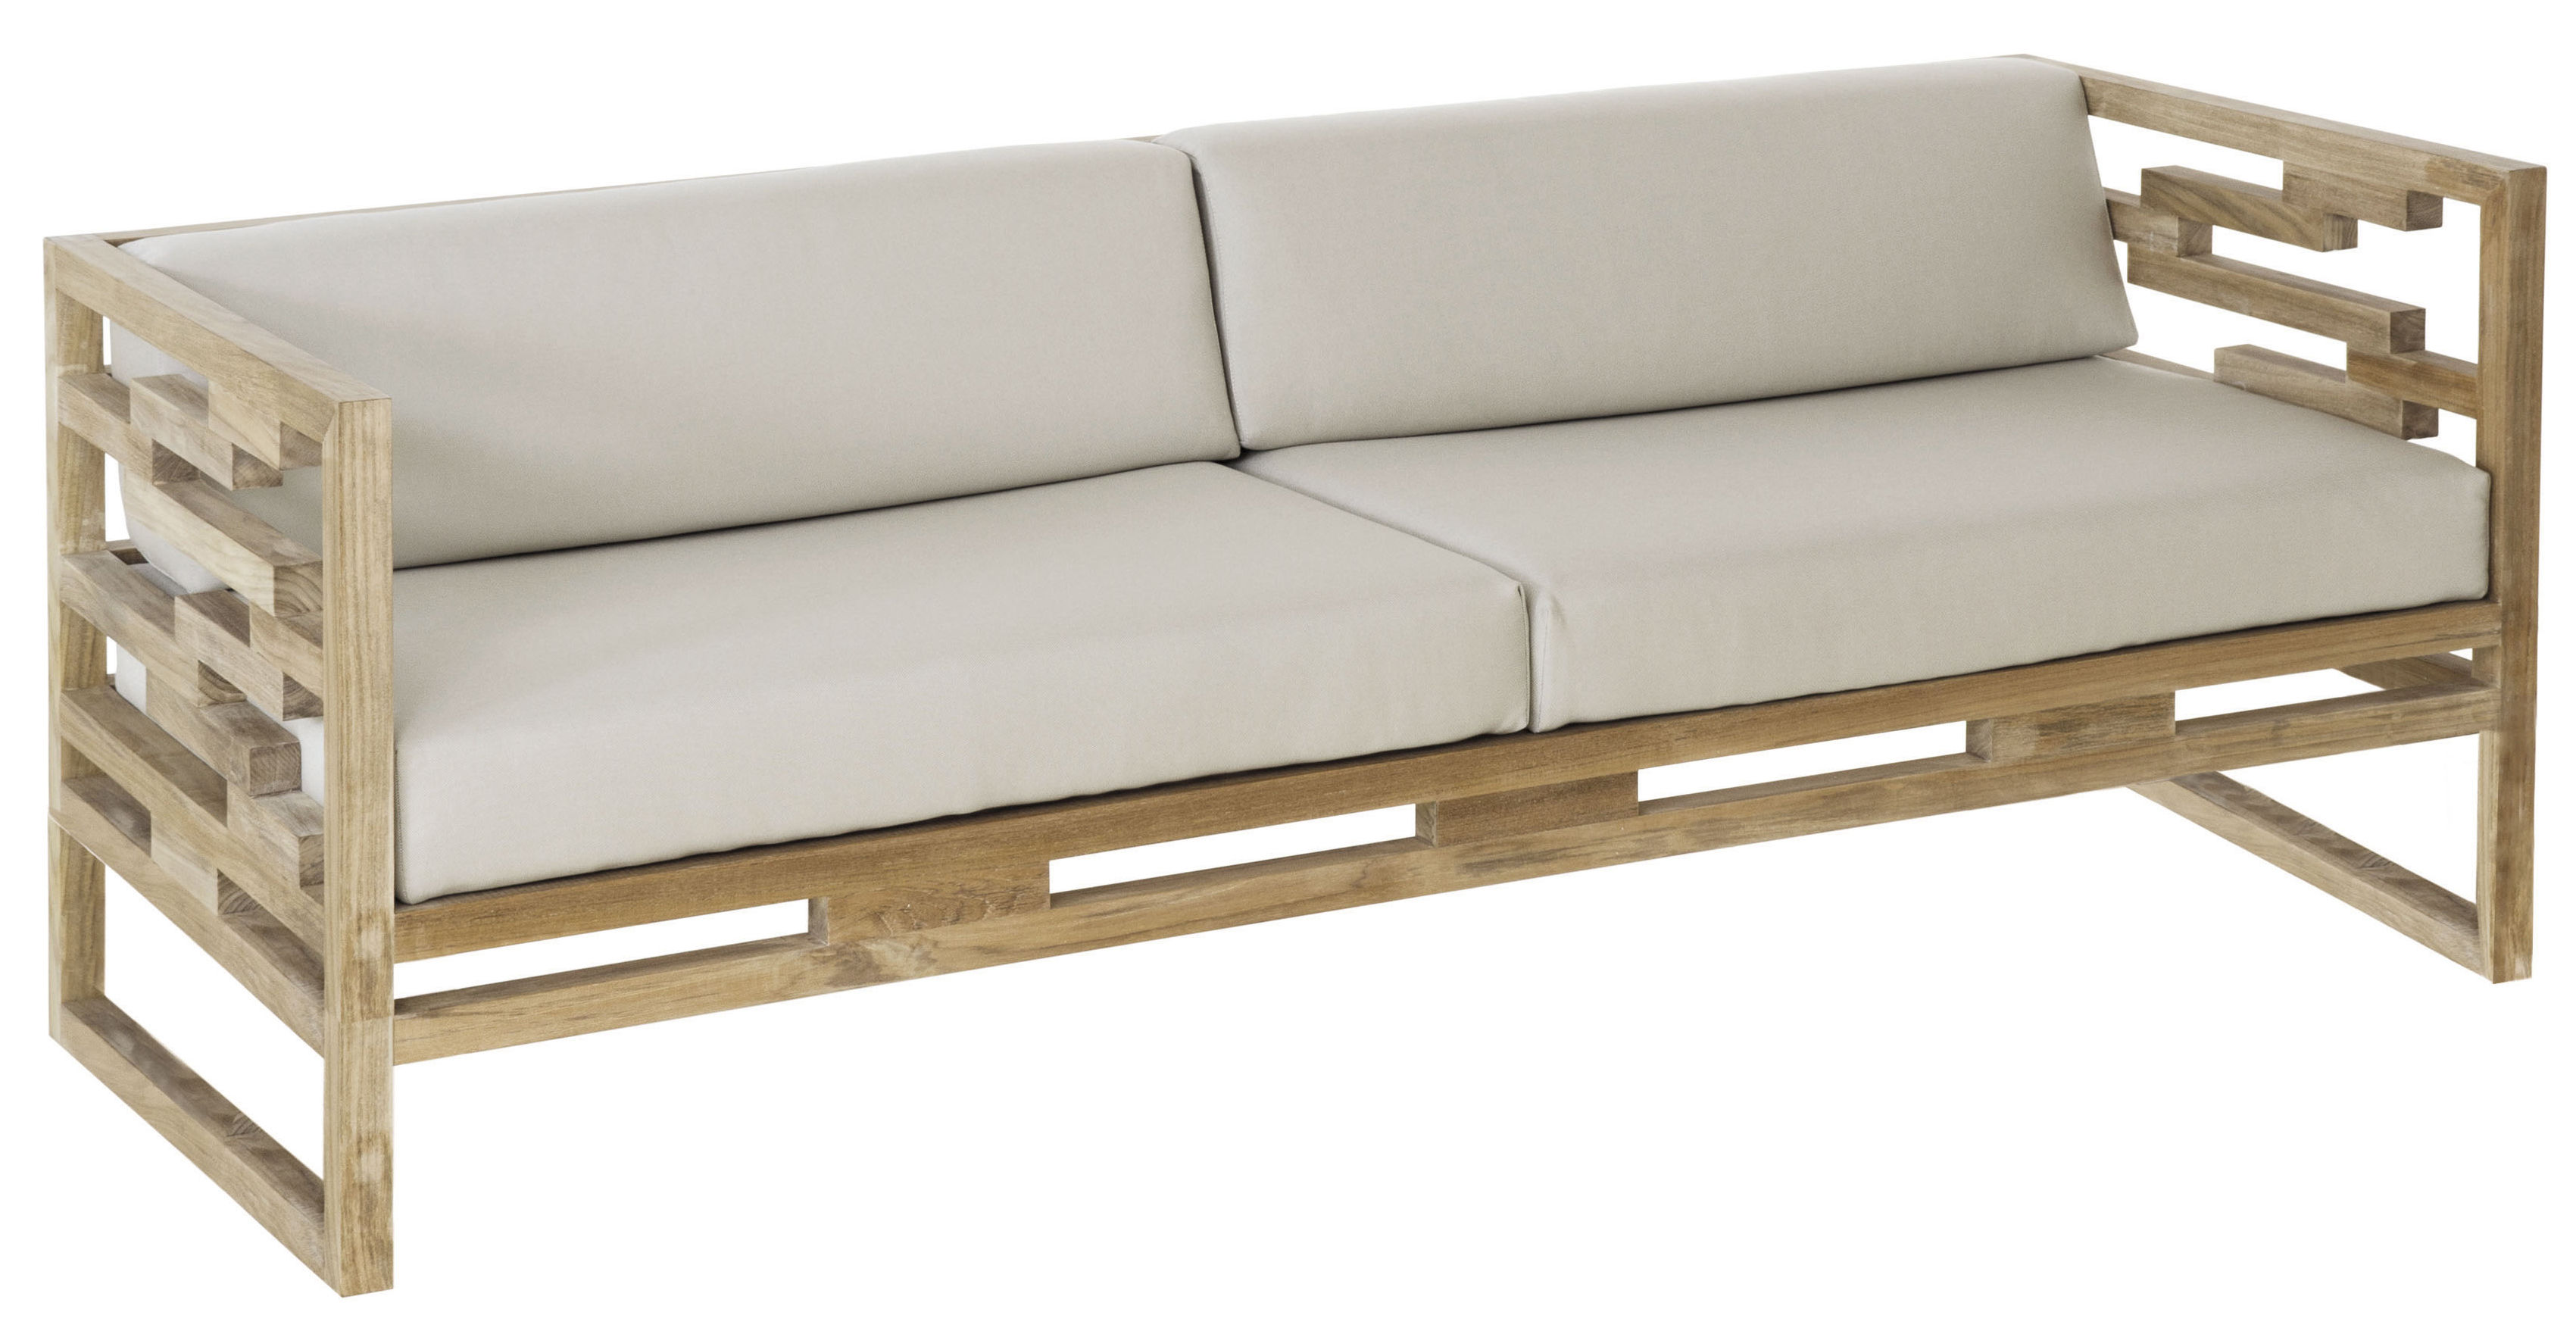 canap droit kontiki teck l 195 cm teck coussin beige perle emu made in design. Black Bedroom Furniture Sets. Home Design Ideas